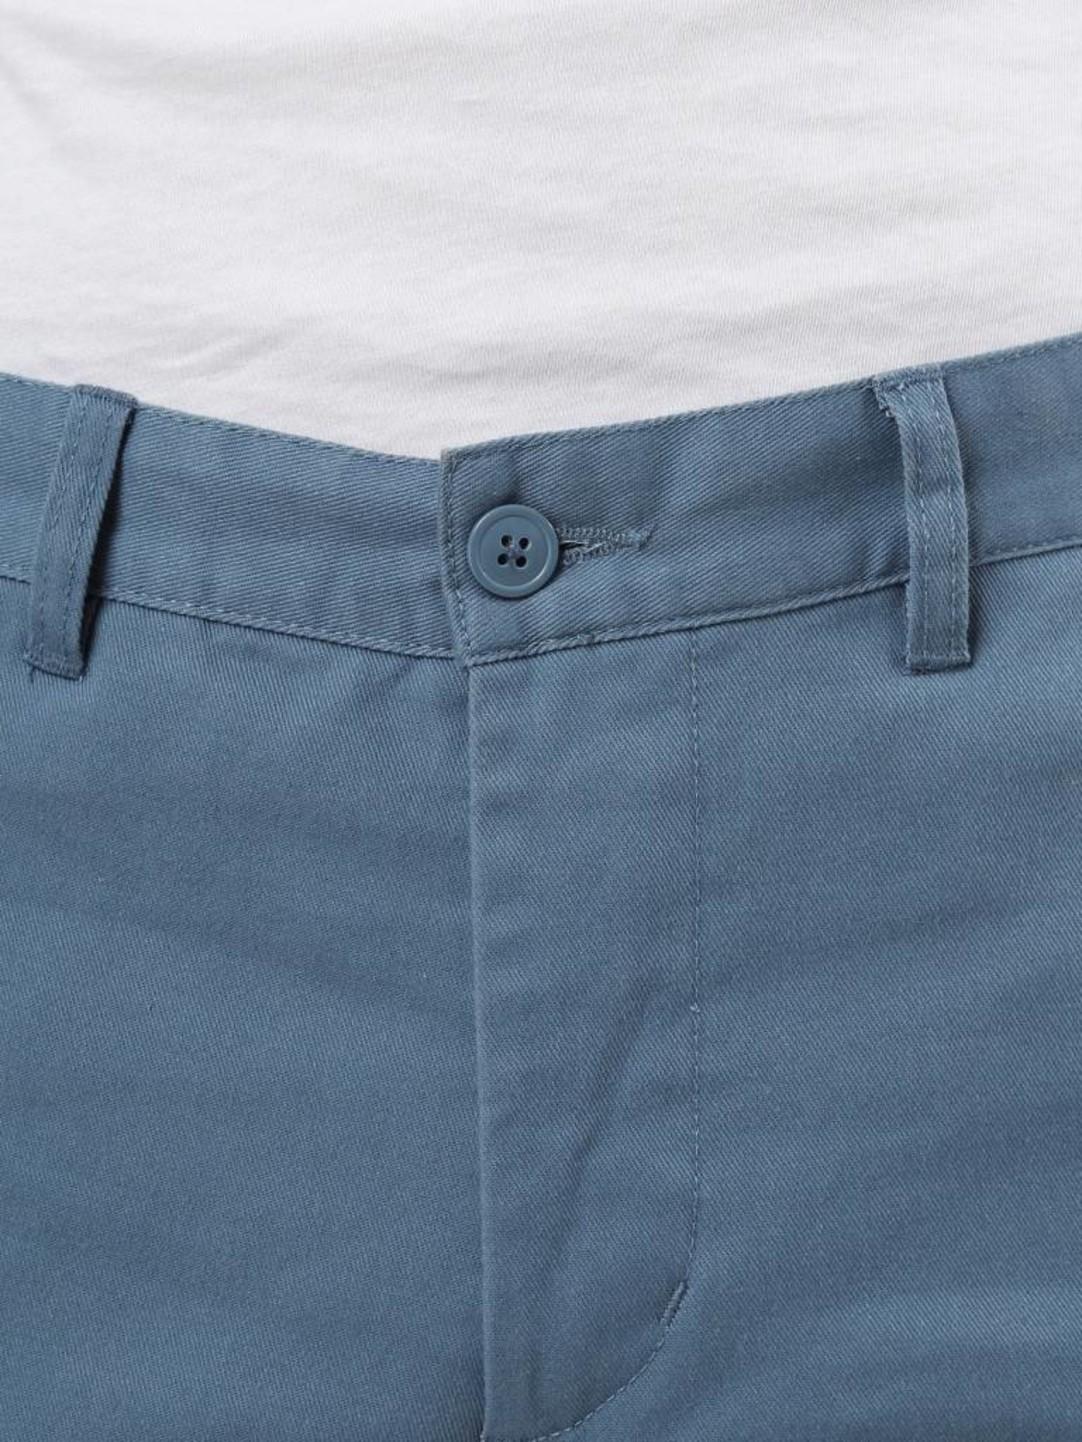 Obey Obey Straggler Flooded Pant Blue 142020060